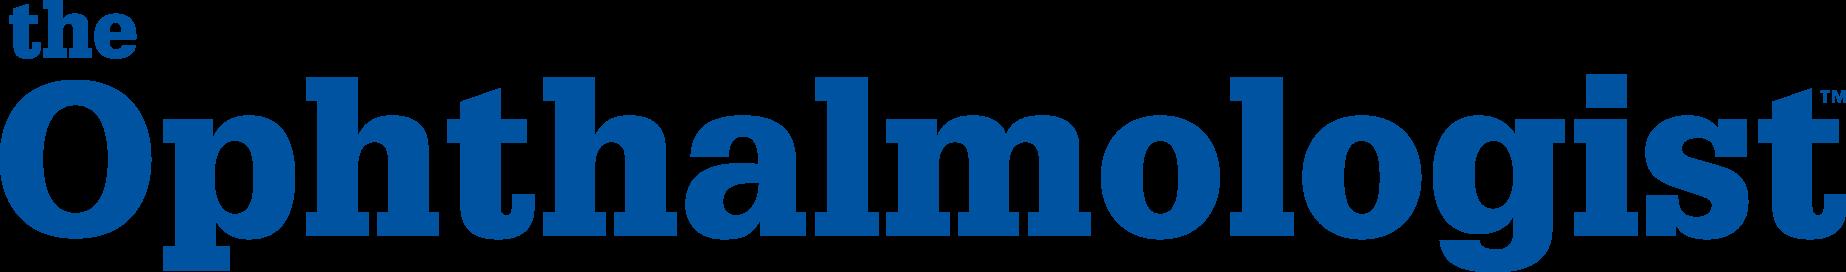 The Ophthalmologist Logo